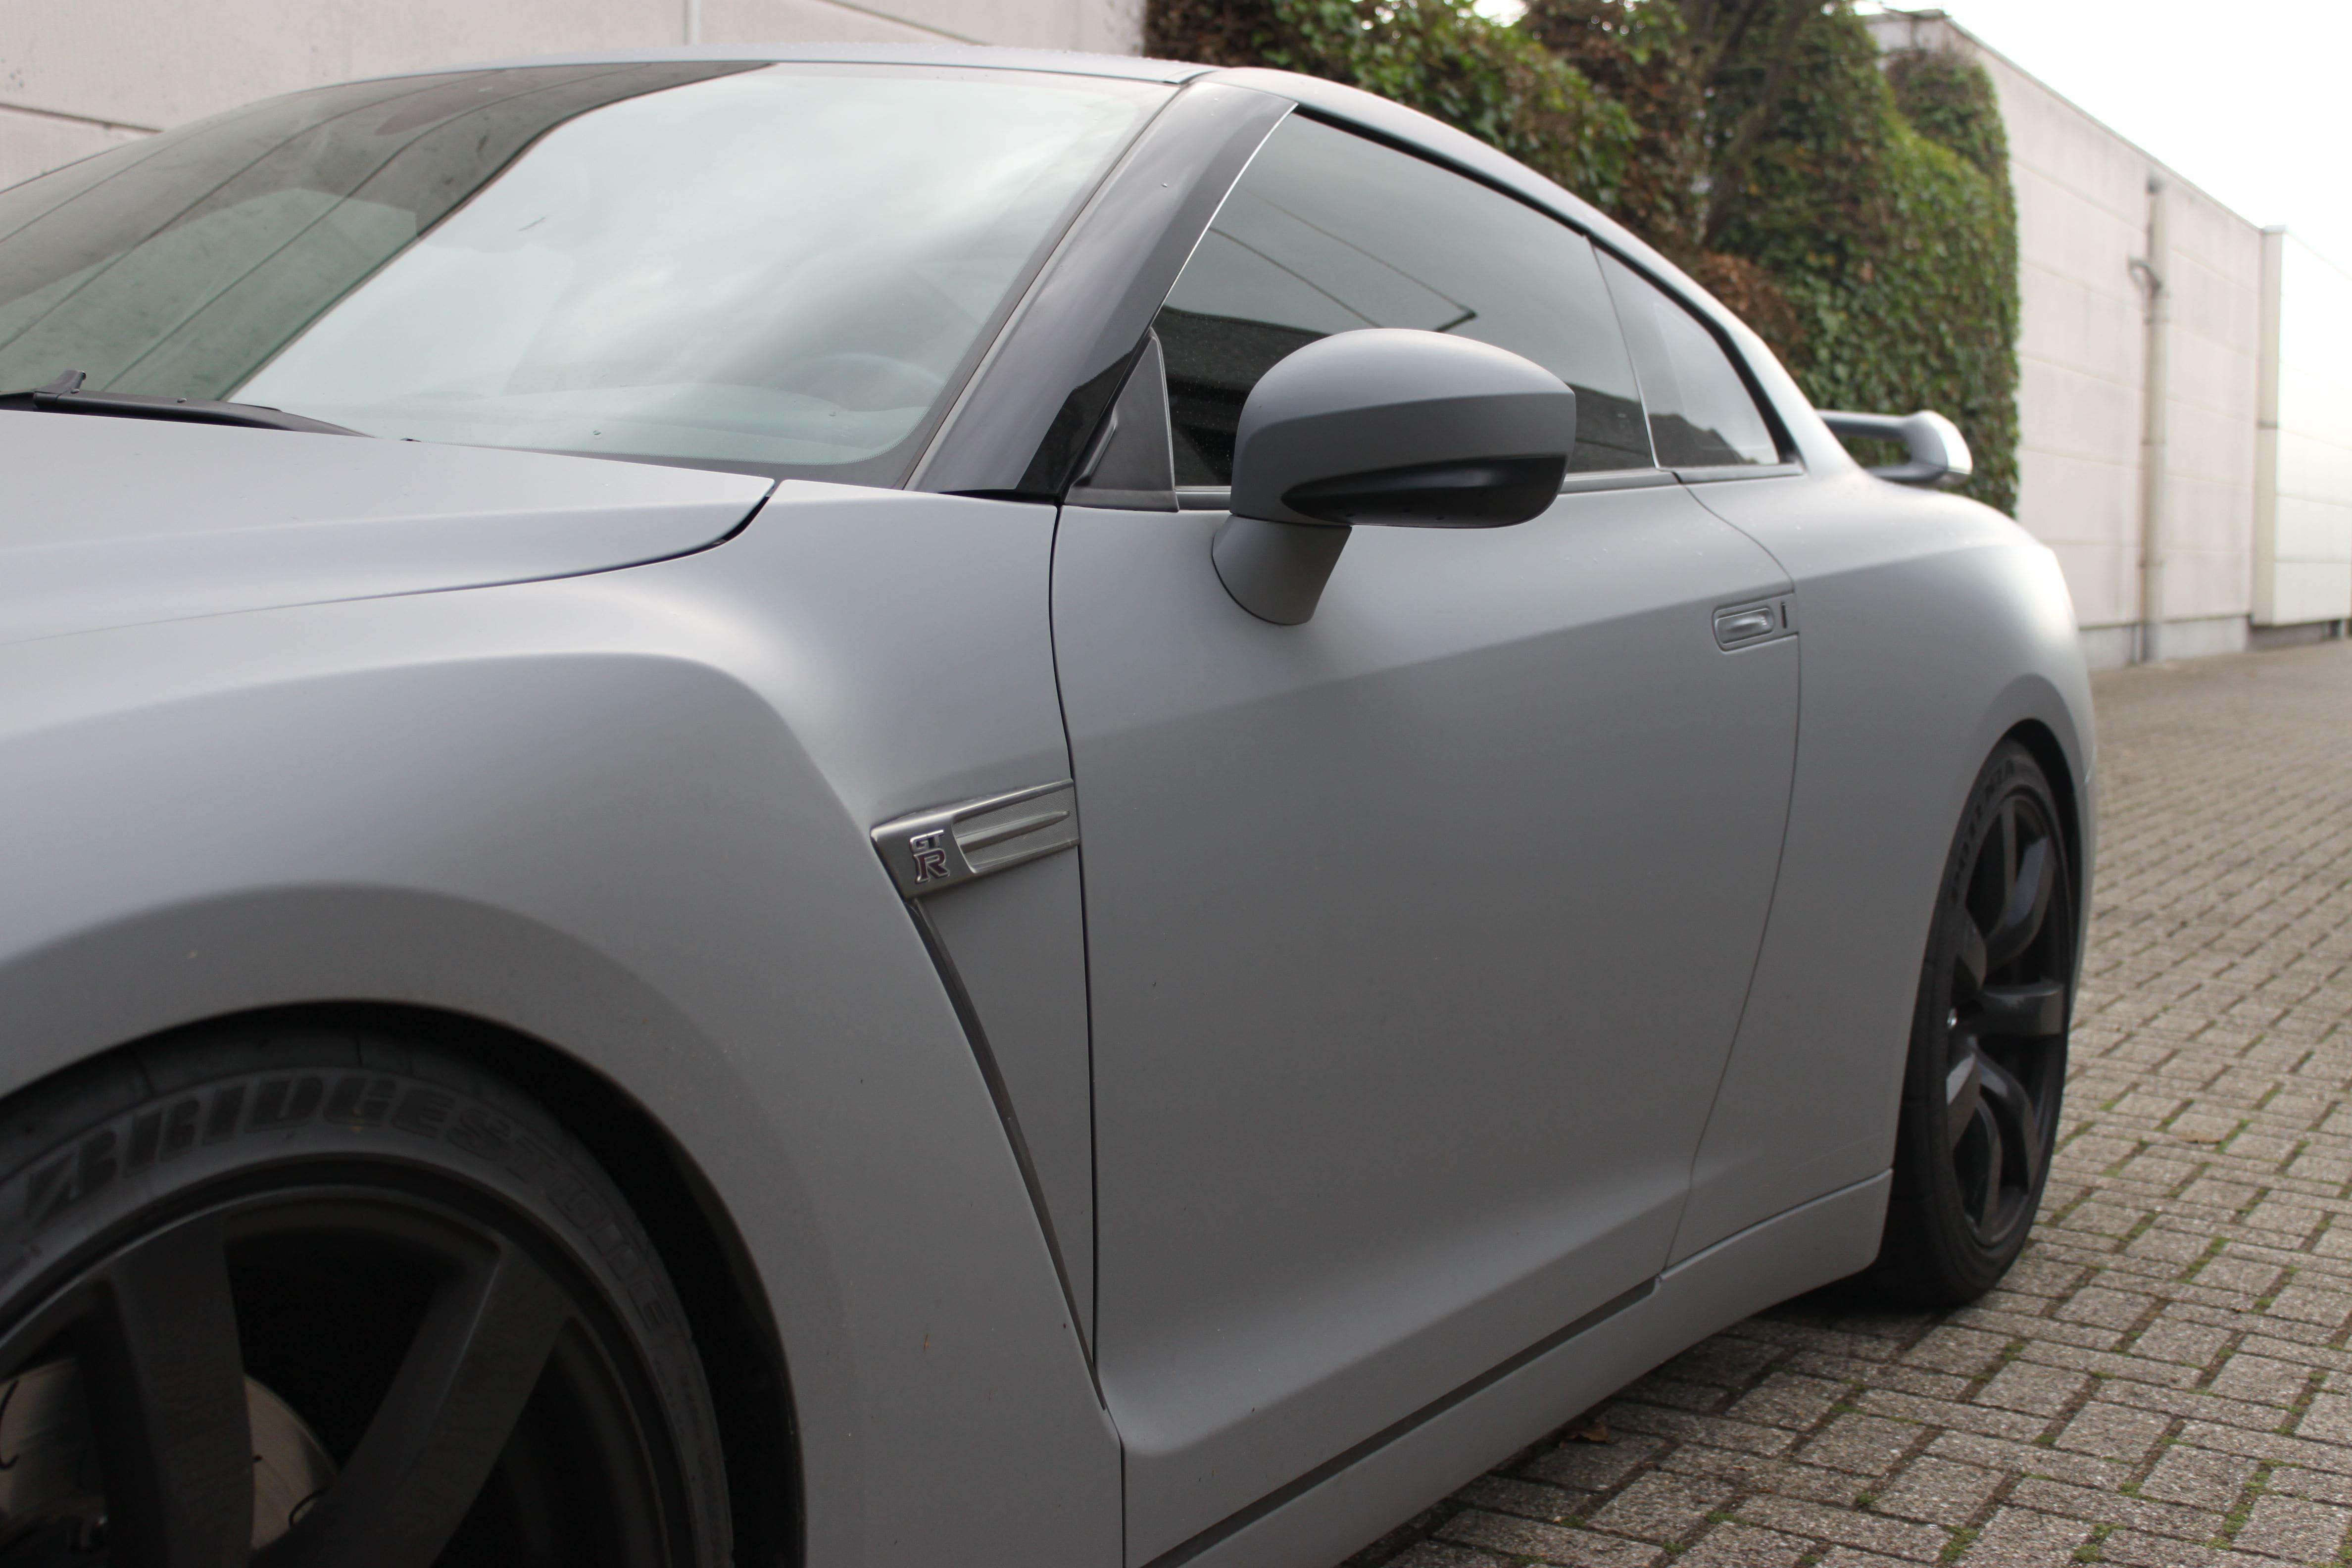 Nissan GT-R met Mat Grijze Wrap, Carwrapping door Wrapmyride.nu Foto-nr:6563, ©2020